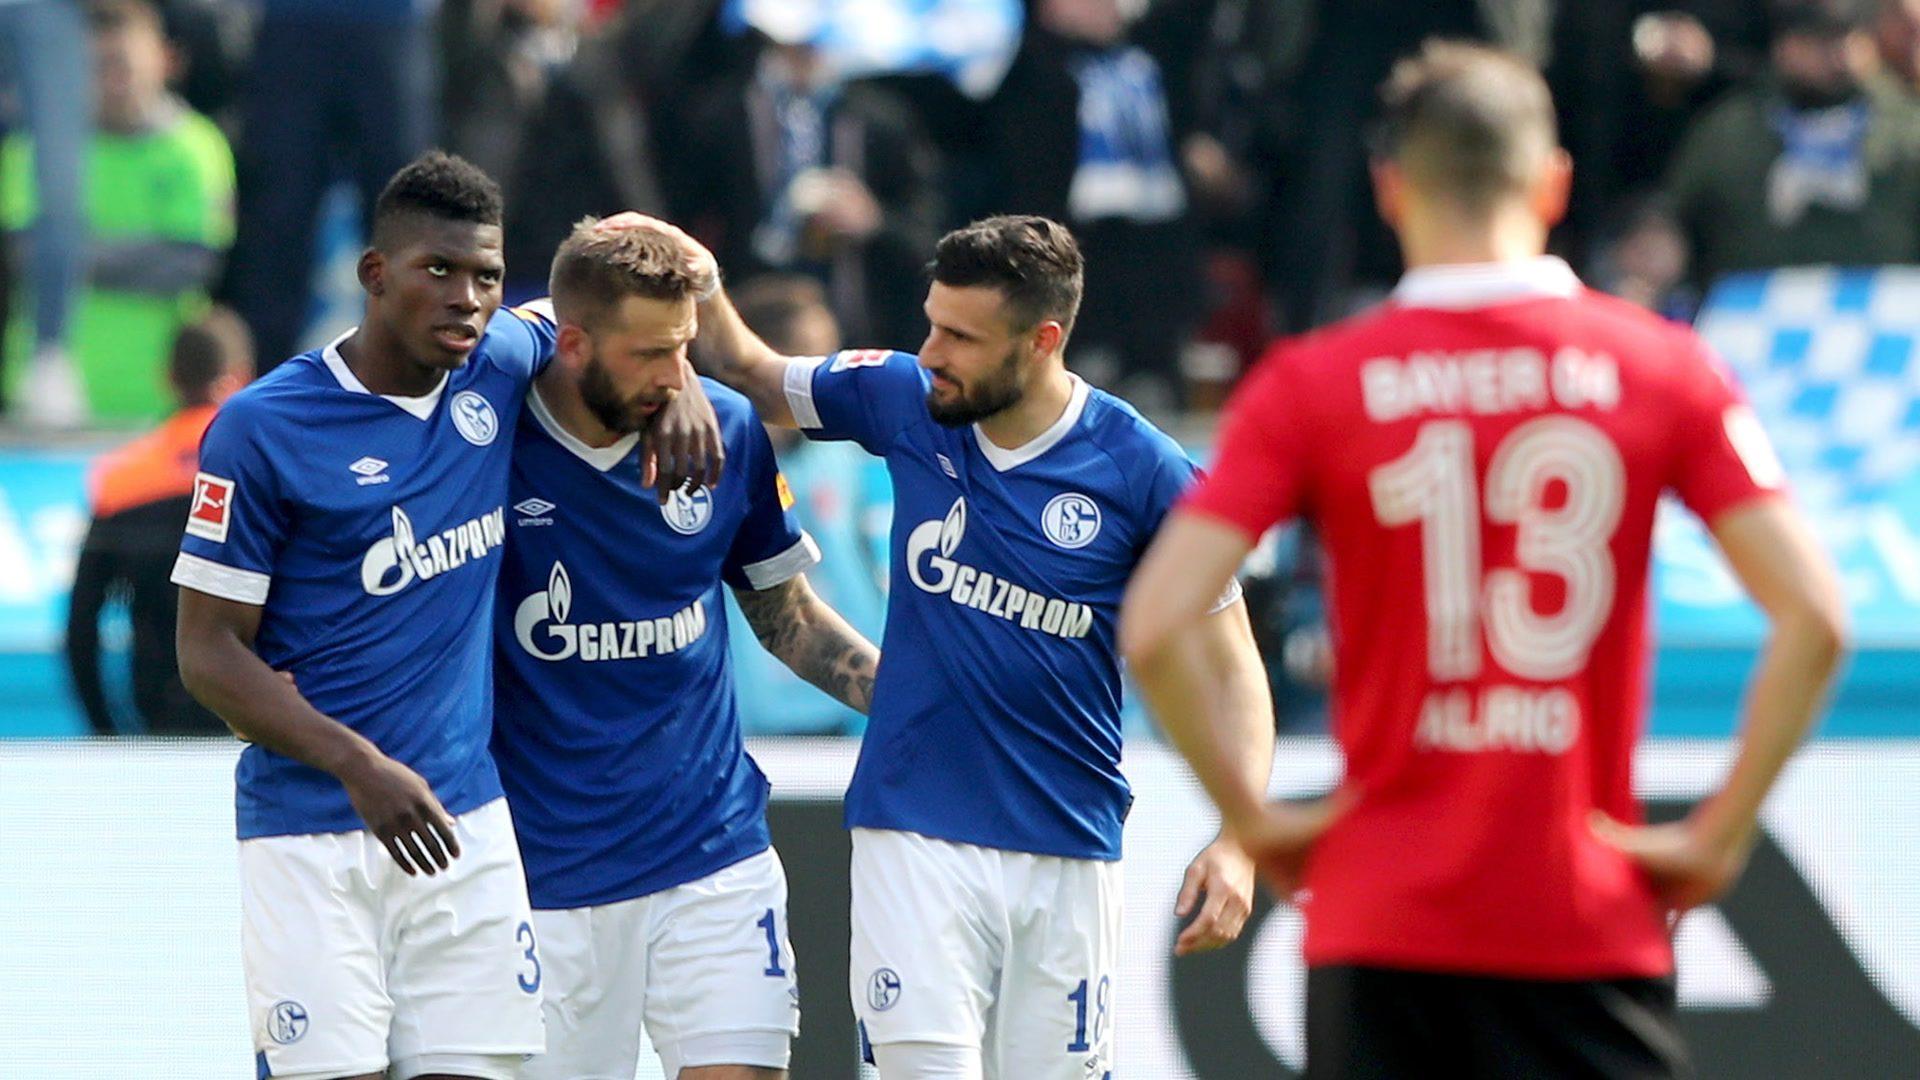 Schalke dent Leverkusen's Champions League hopes